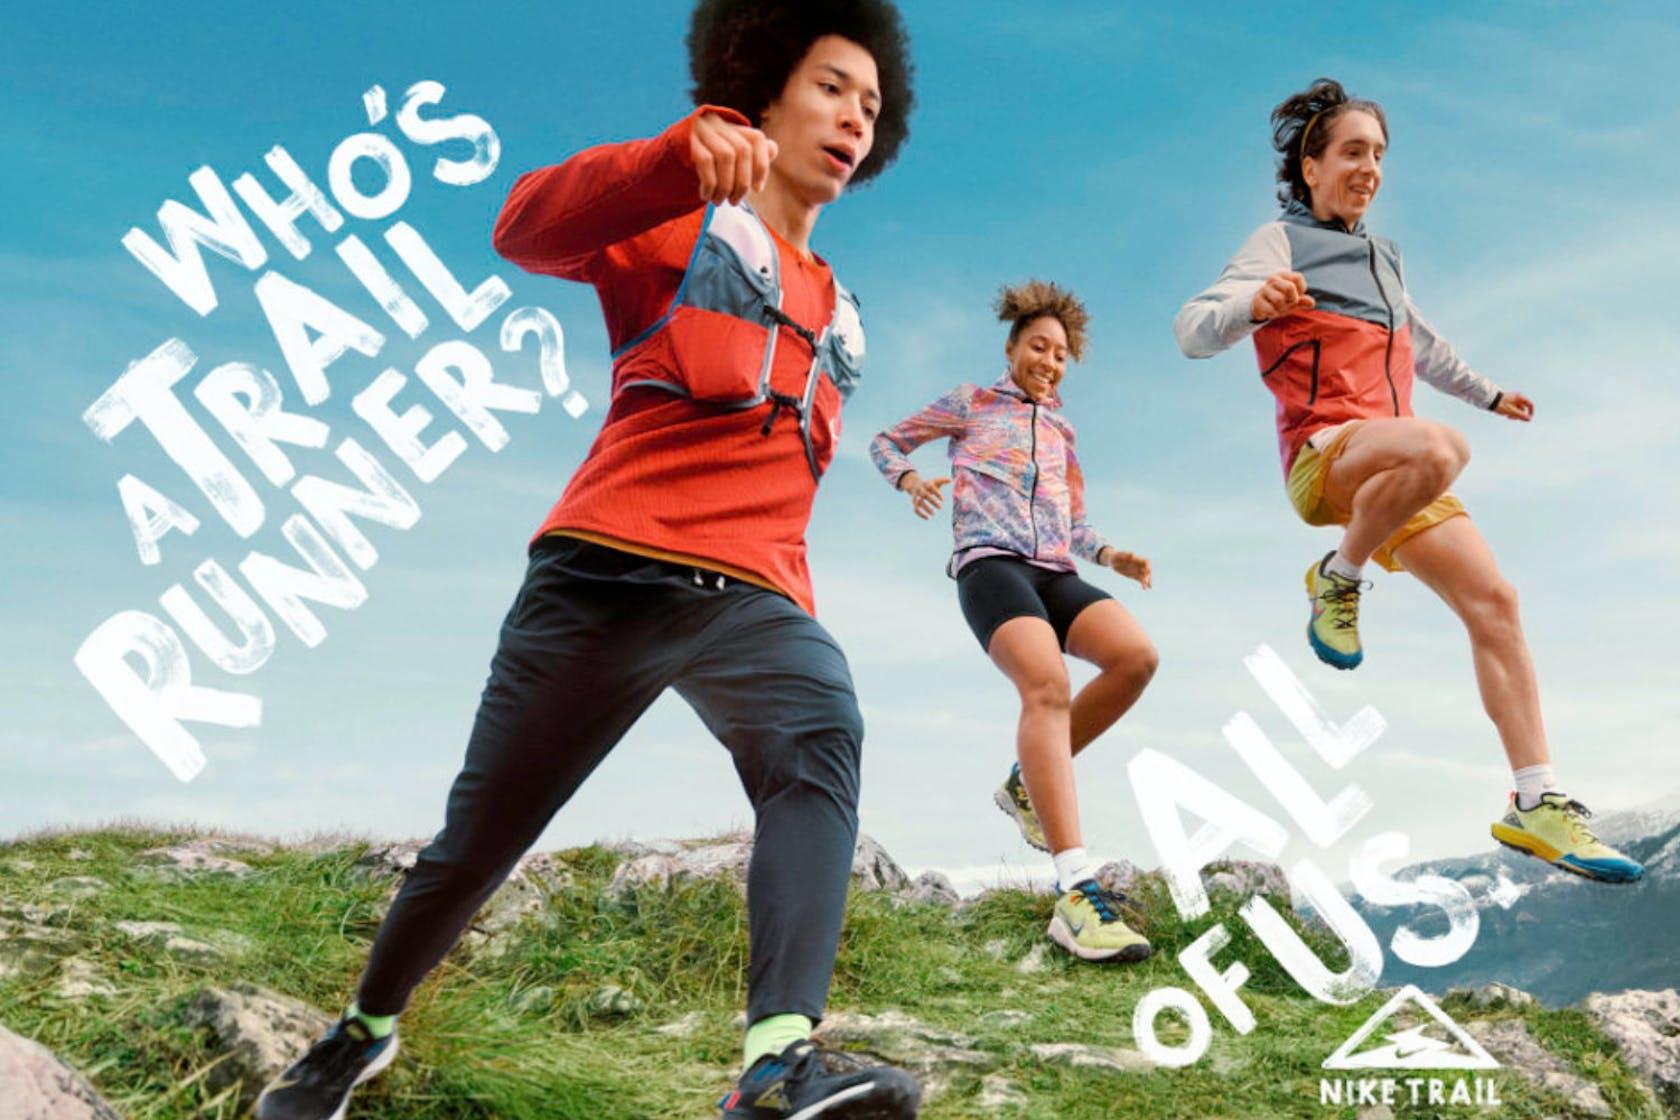 Nike Shop online trail running